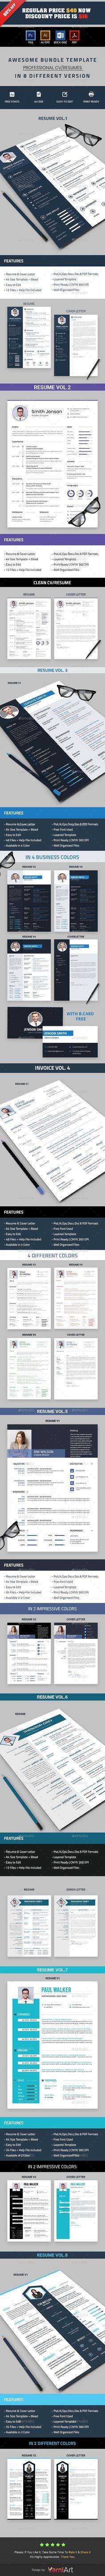 9 best CV images on Pinterest | Resume design, Cv template and ...